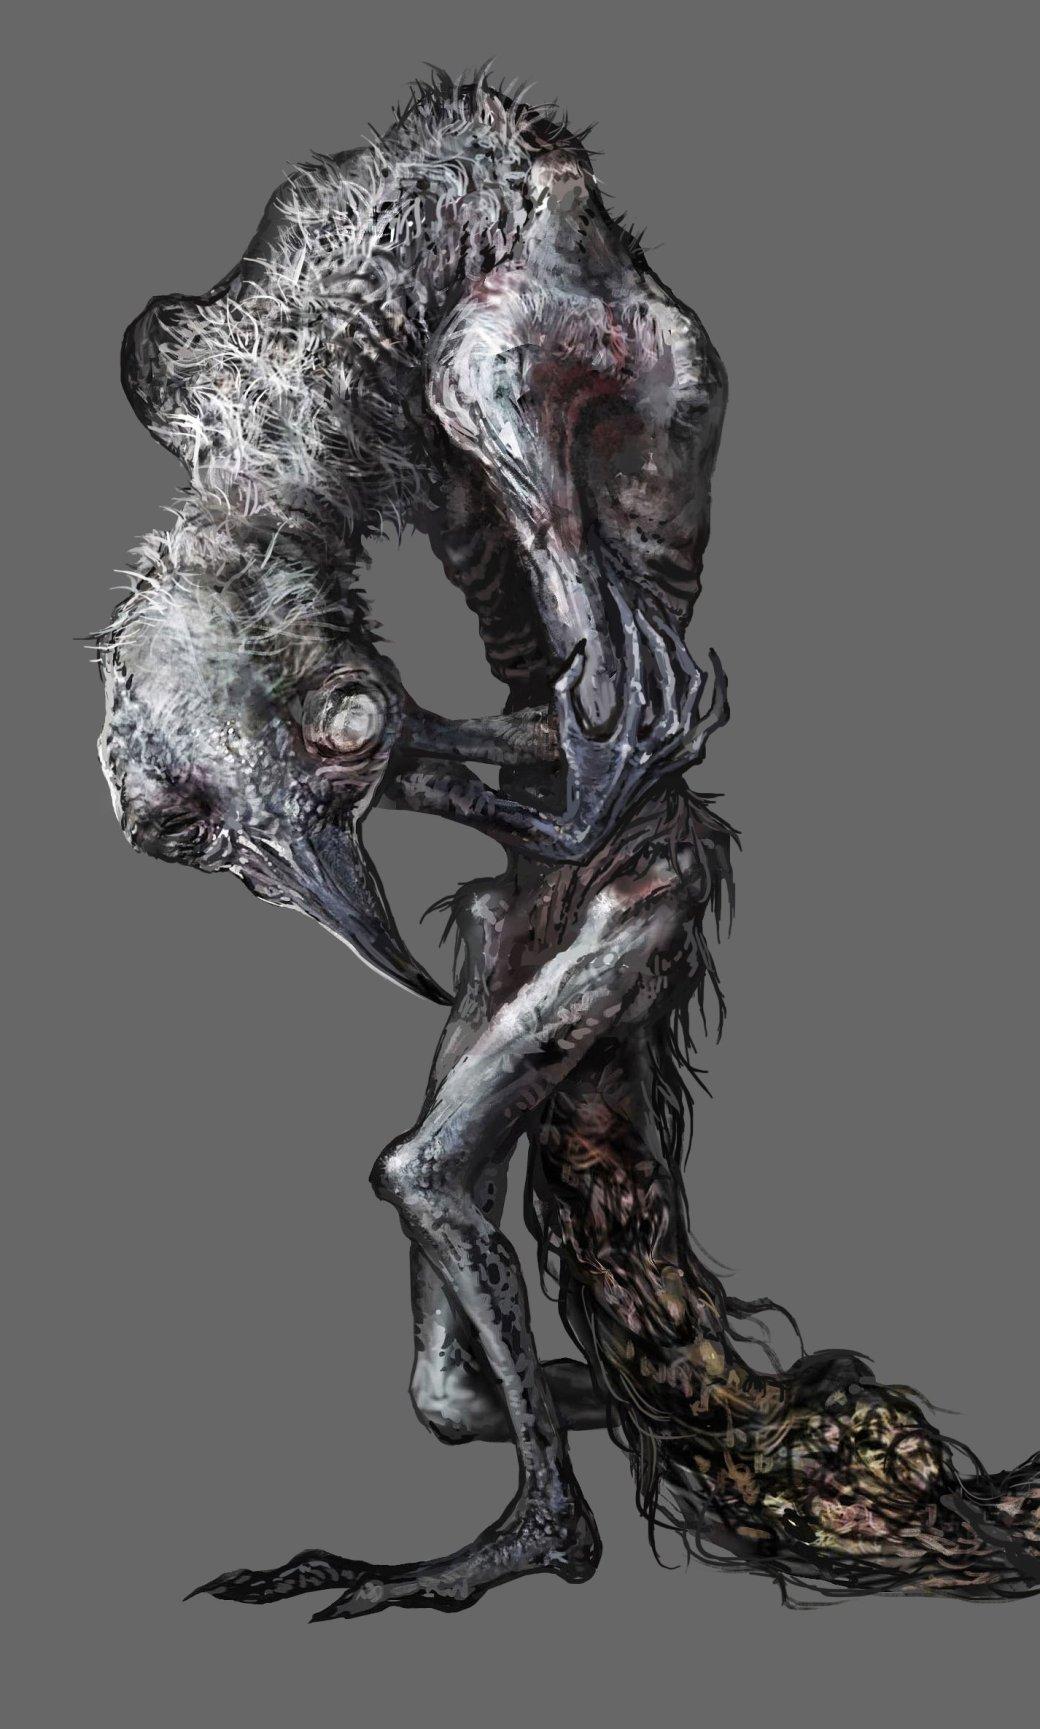 Рецензия на Dark Souls 3: Ashes of Ariandel - Изображение 4